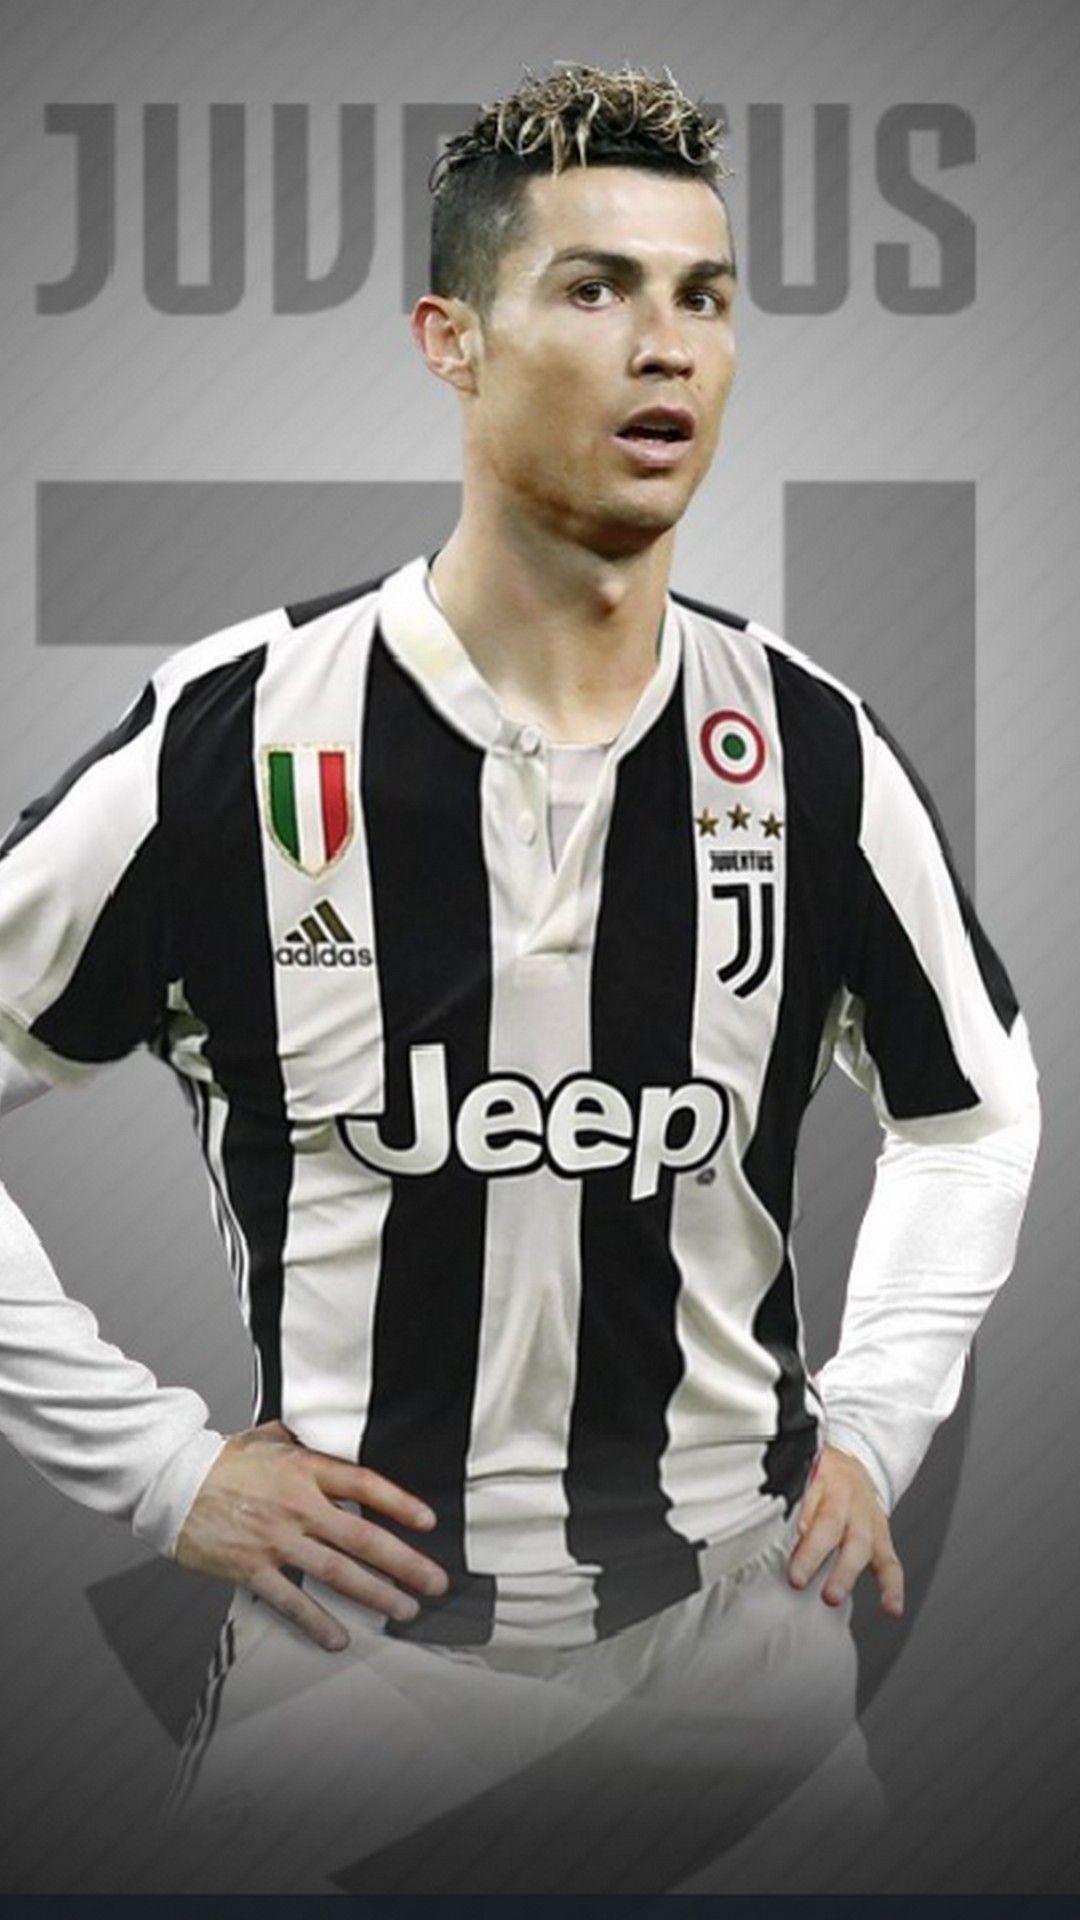 Wallpaper Cristiano Ronaldo Juventus Android   Best Mobile 1080x1920